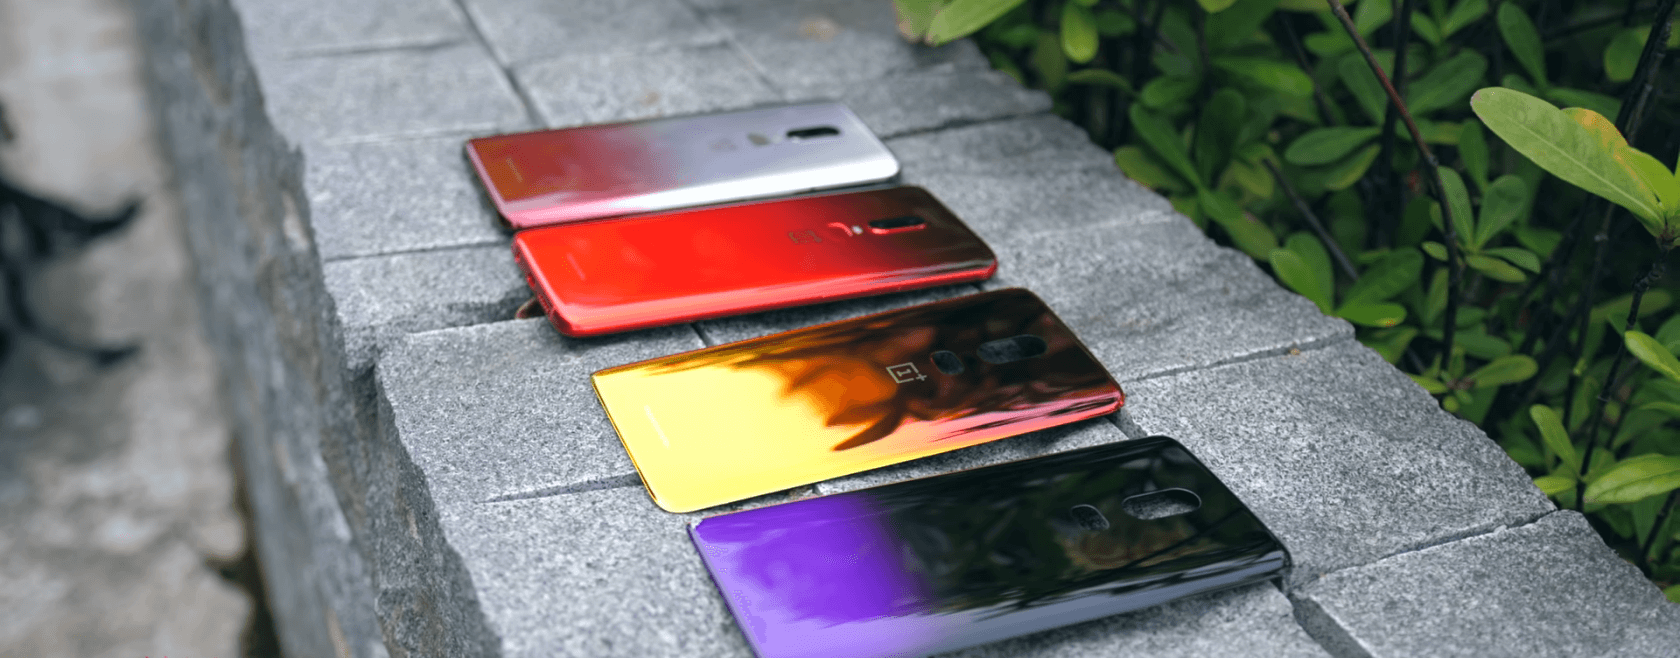 Блогеру показали, каким мог быть OnePlus 6